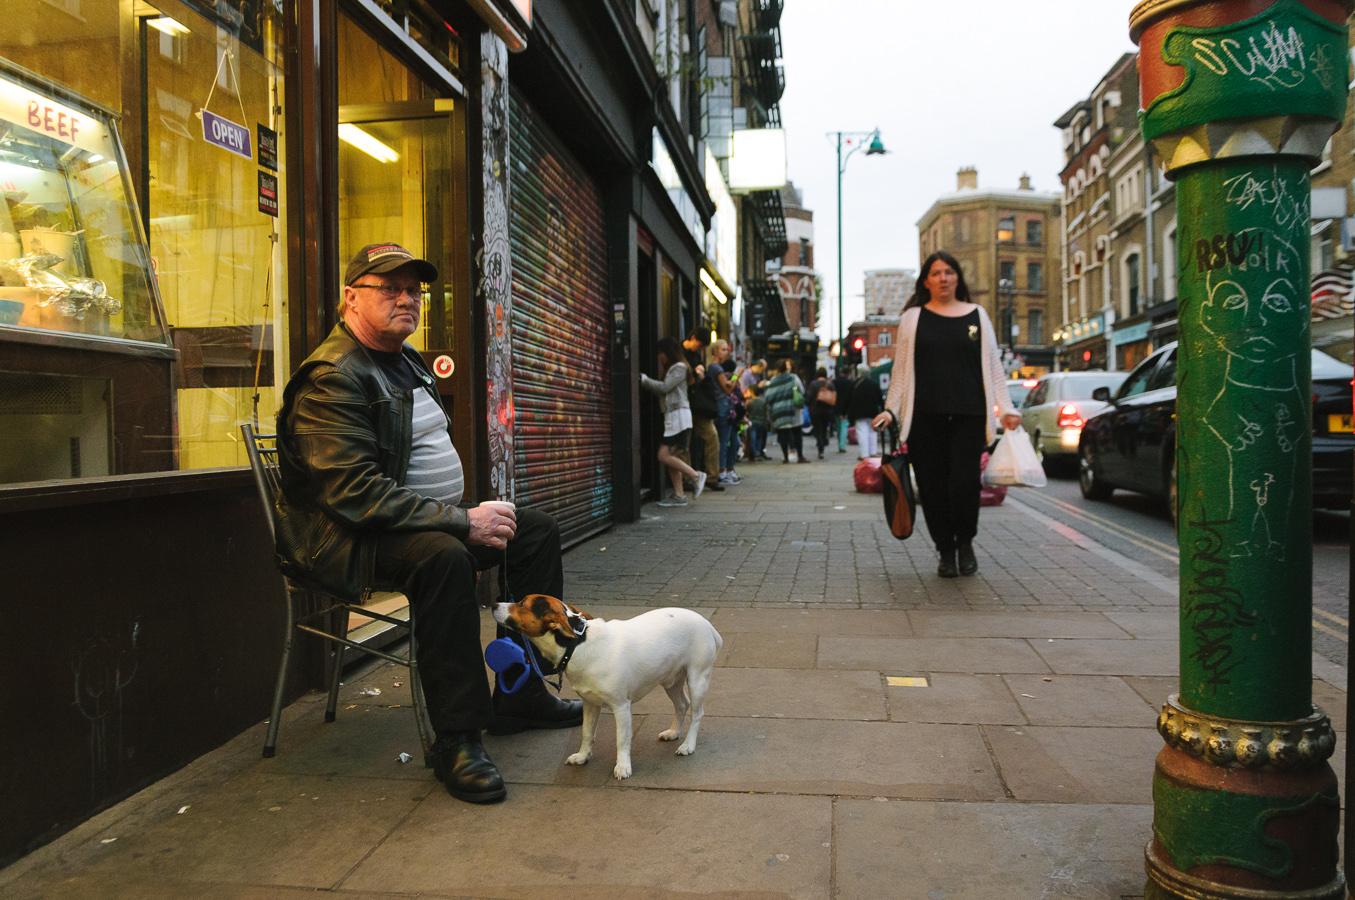 brick-lane-bagles-man-dog-street.jpg